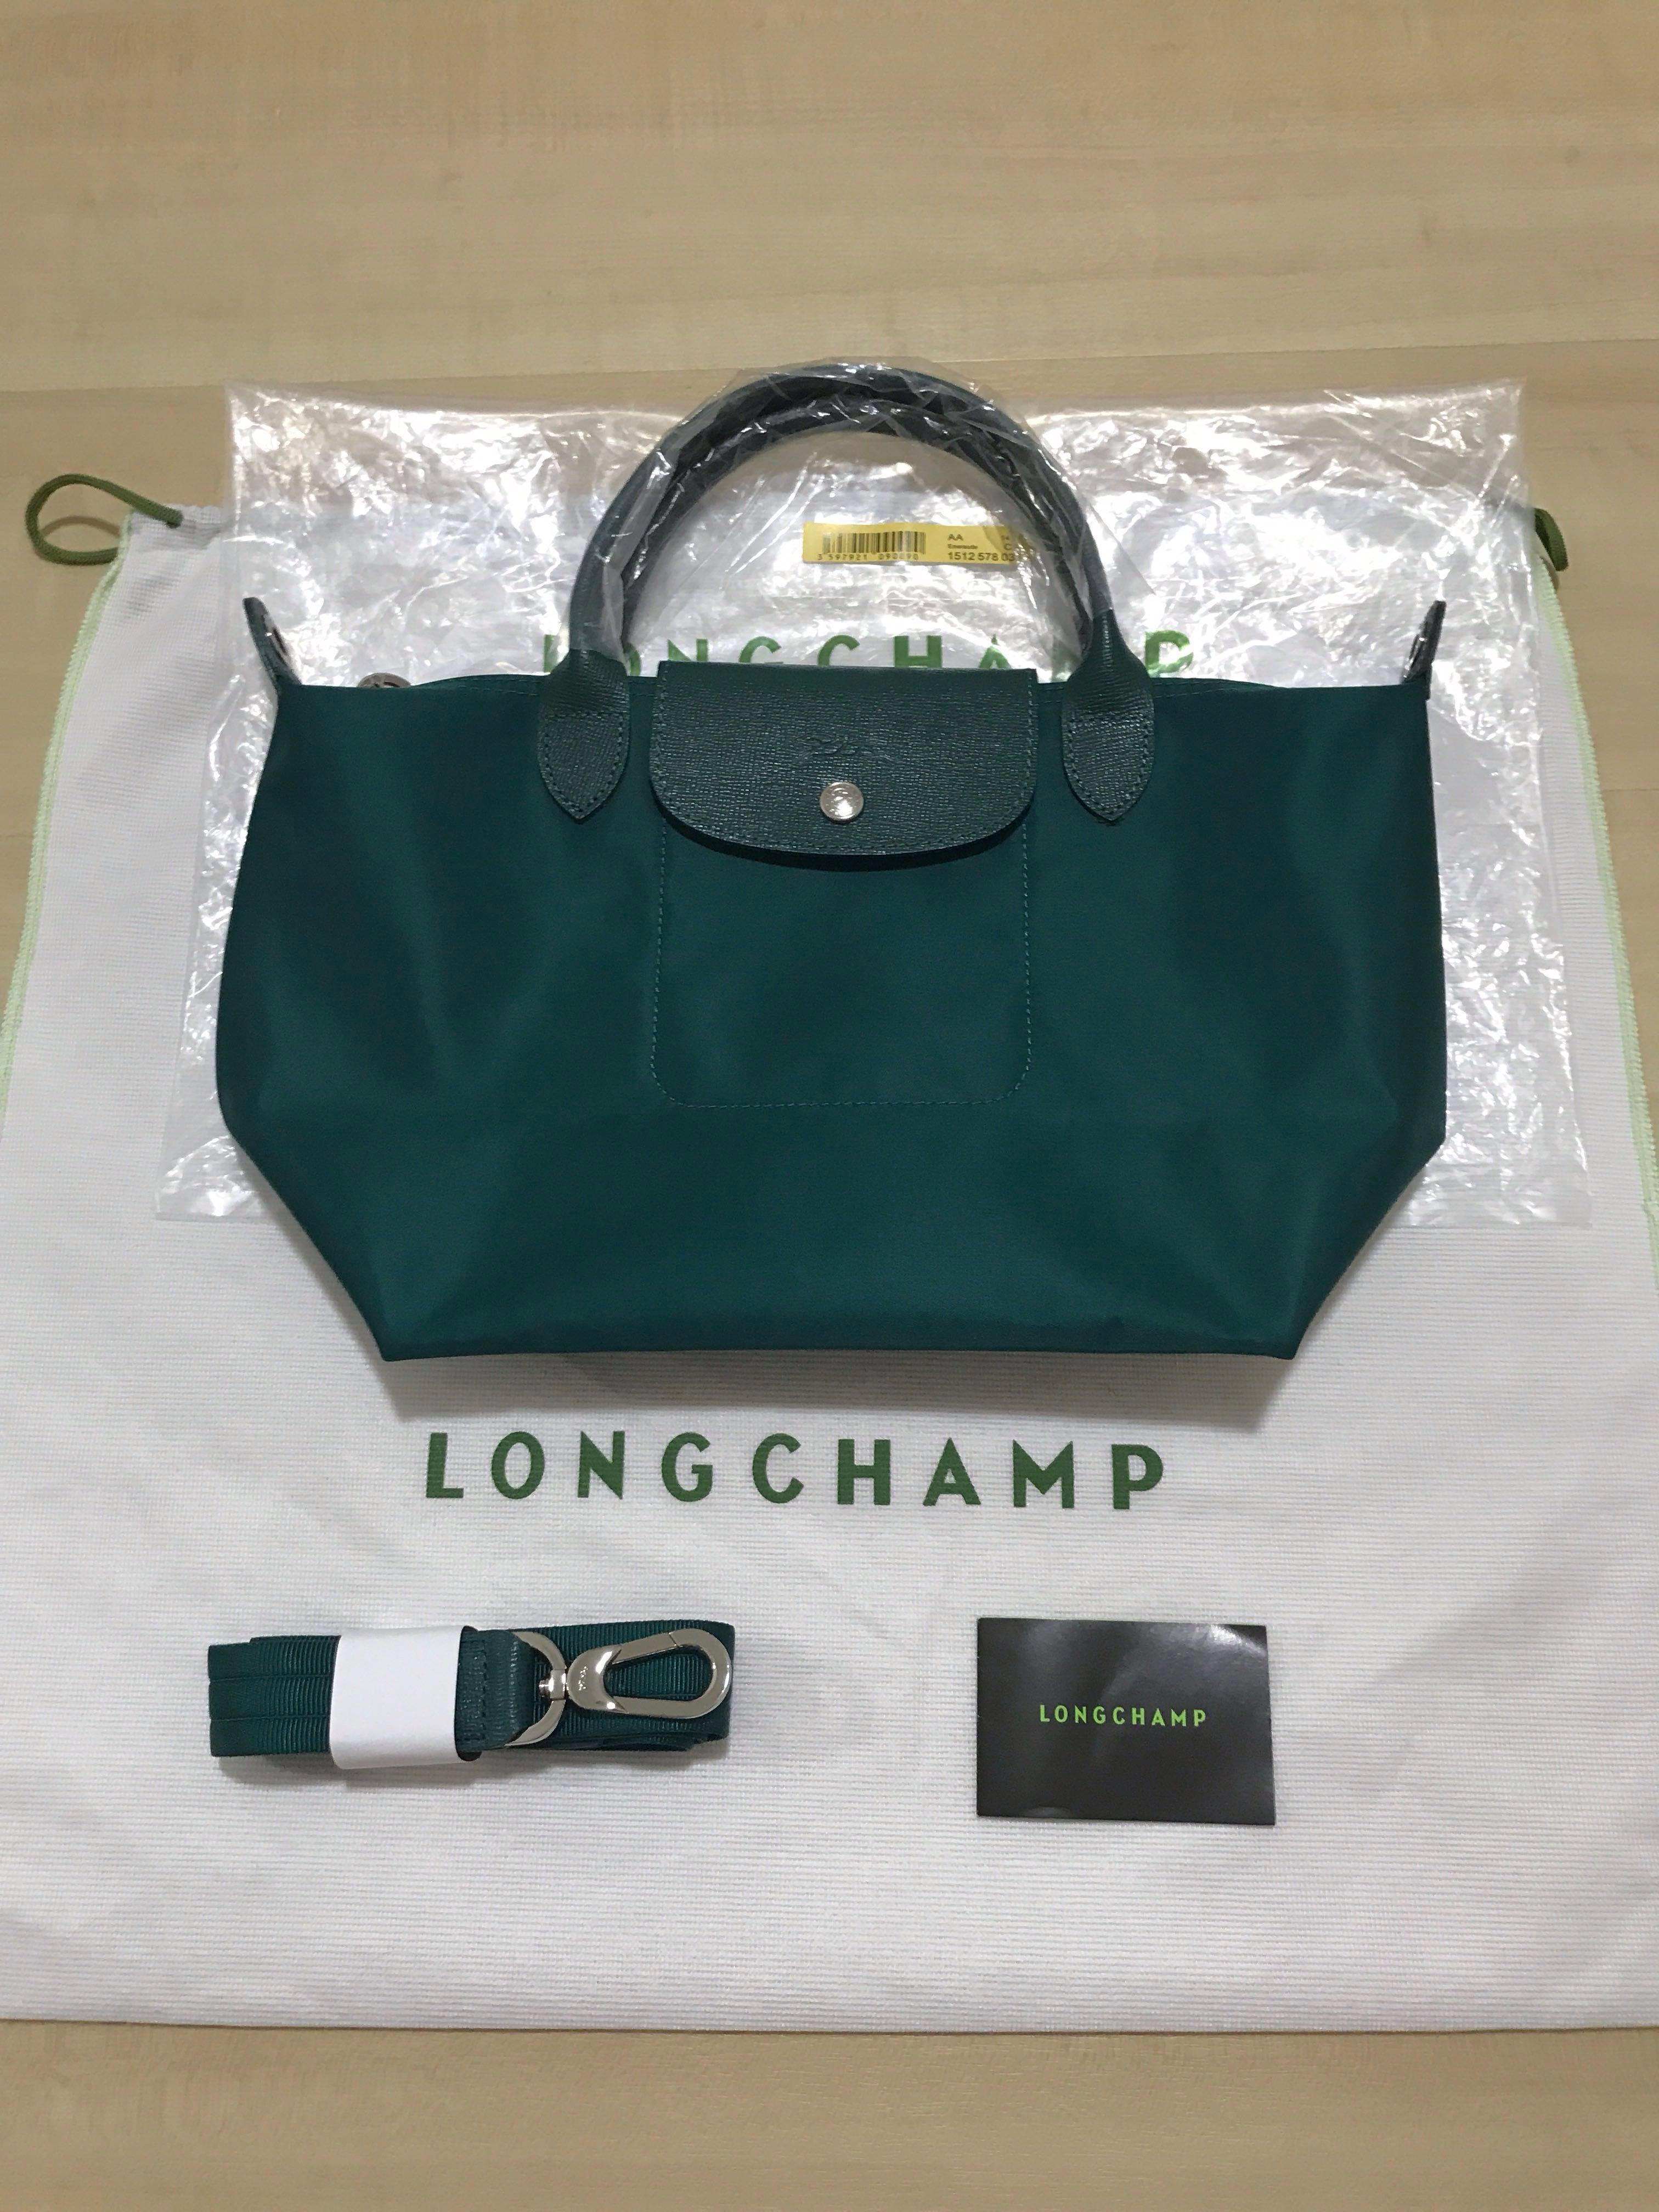 Authentic Longchamp Bag 32bdd8baf7b36